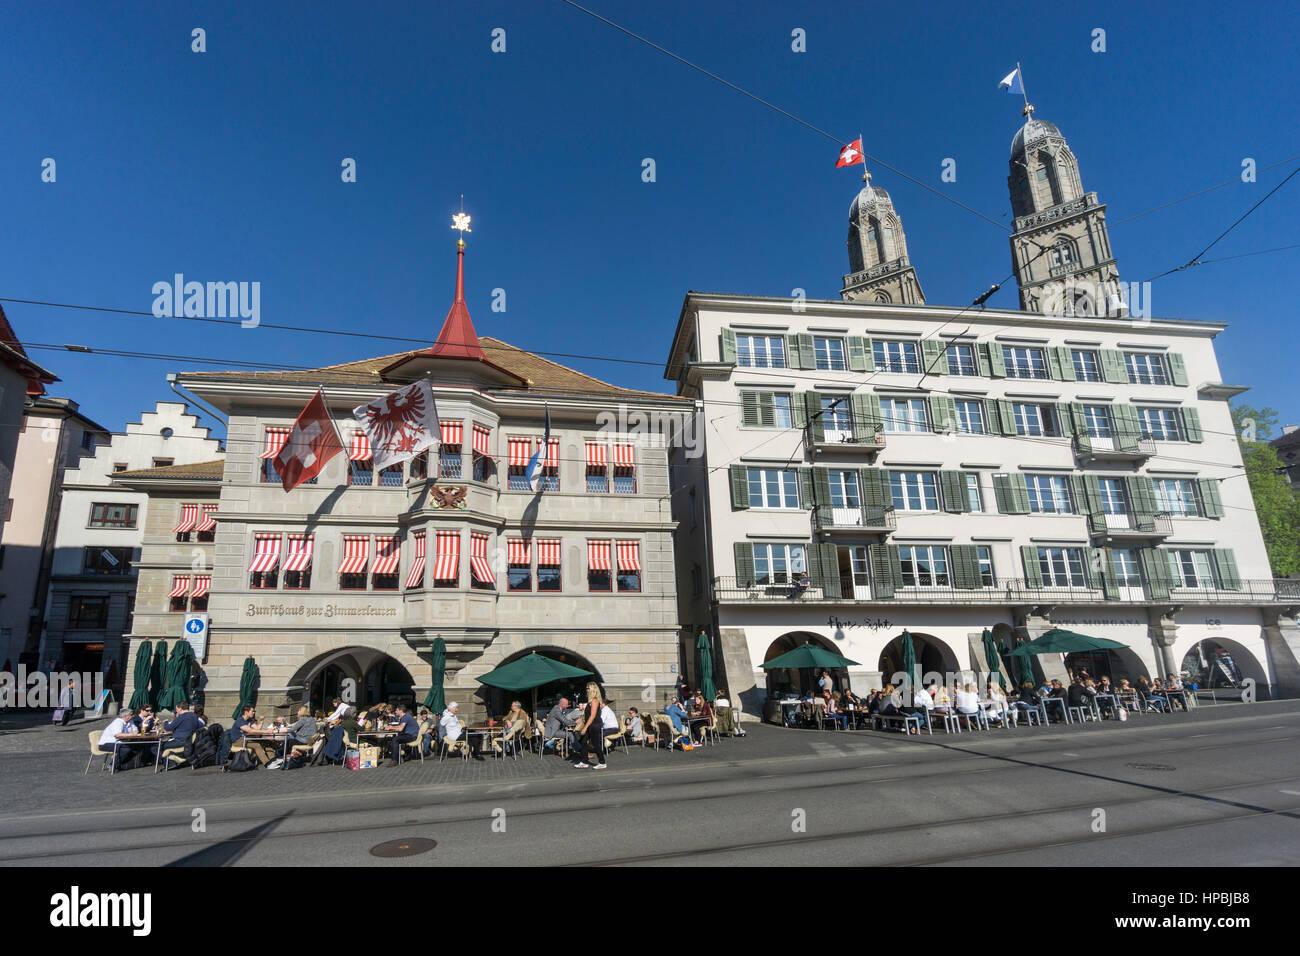 Limmatquai with guild house , Zur Zimmerleuten,  Grossmunster, Cathedral,  old town of Zurich, Canton of Zurich, - Stock Image